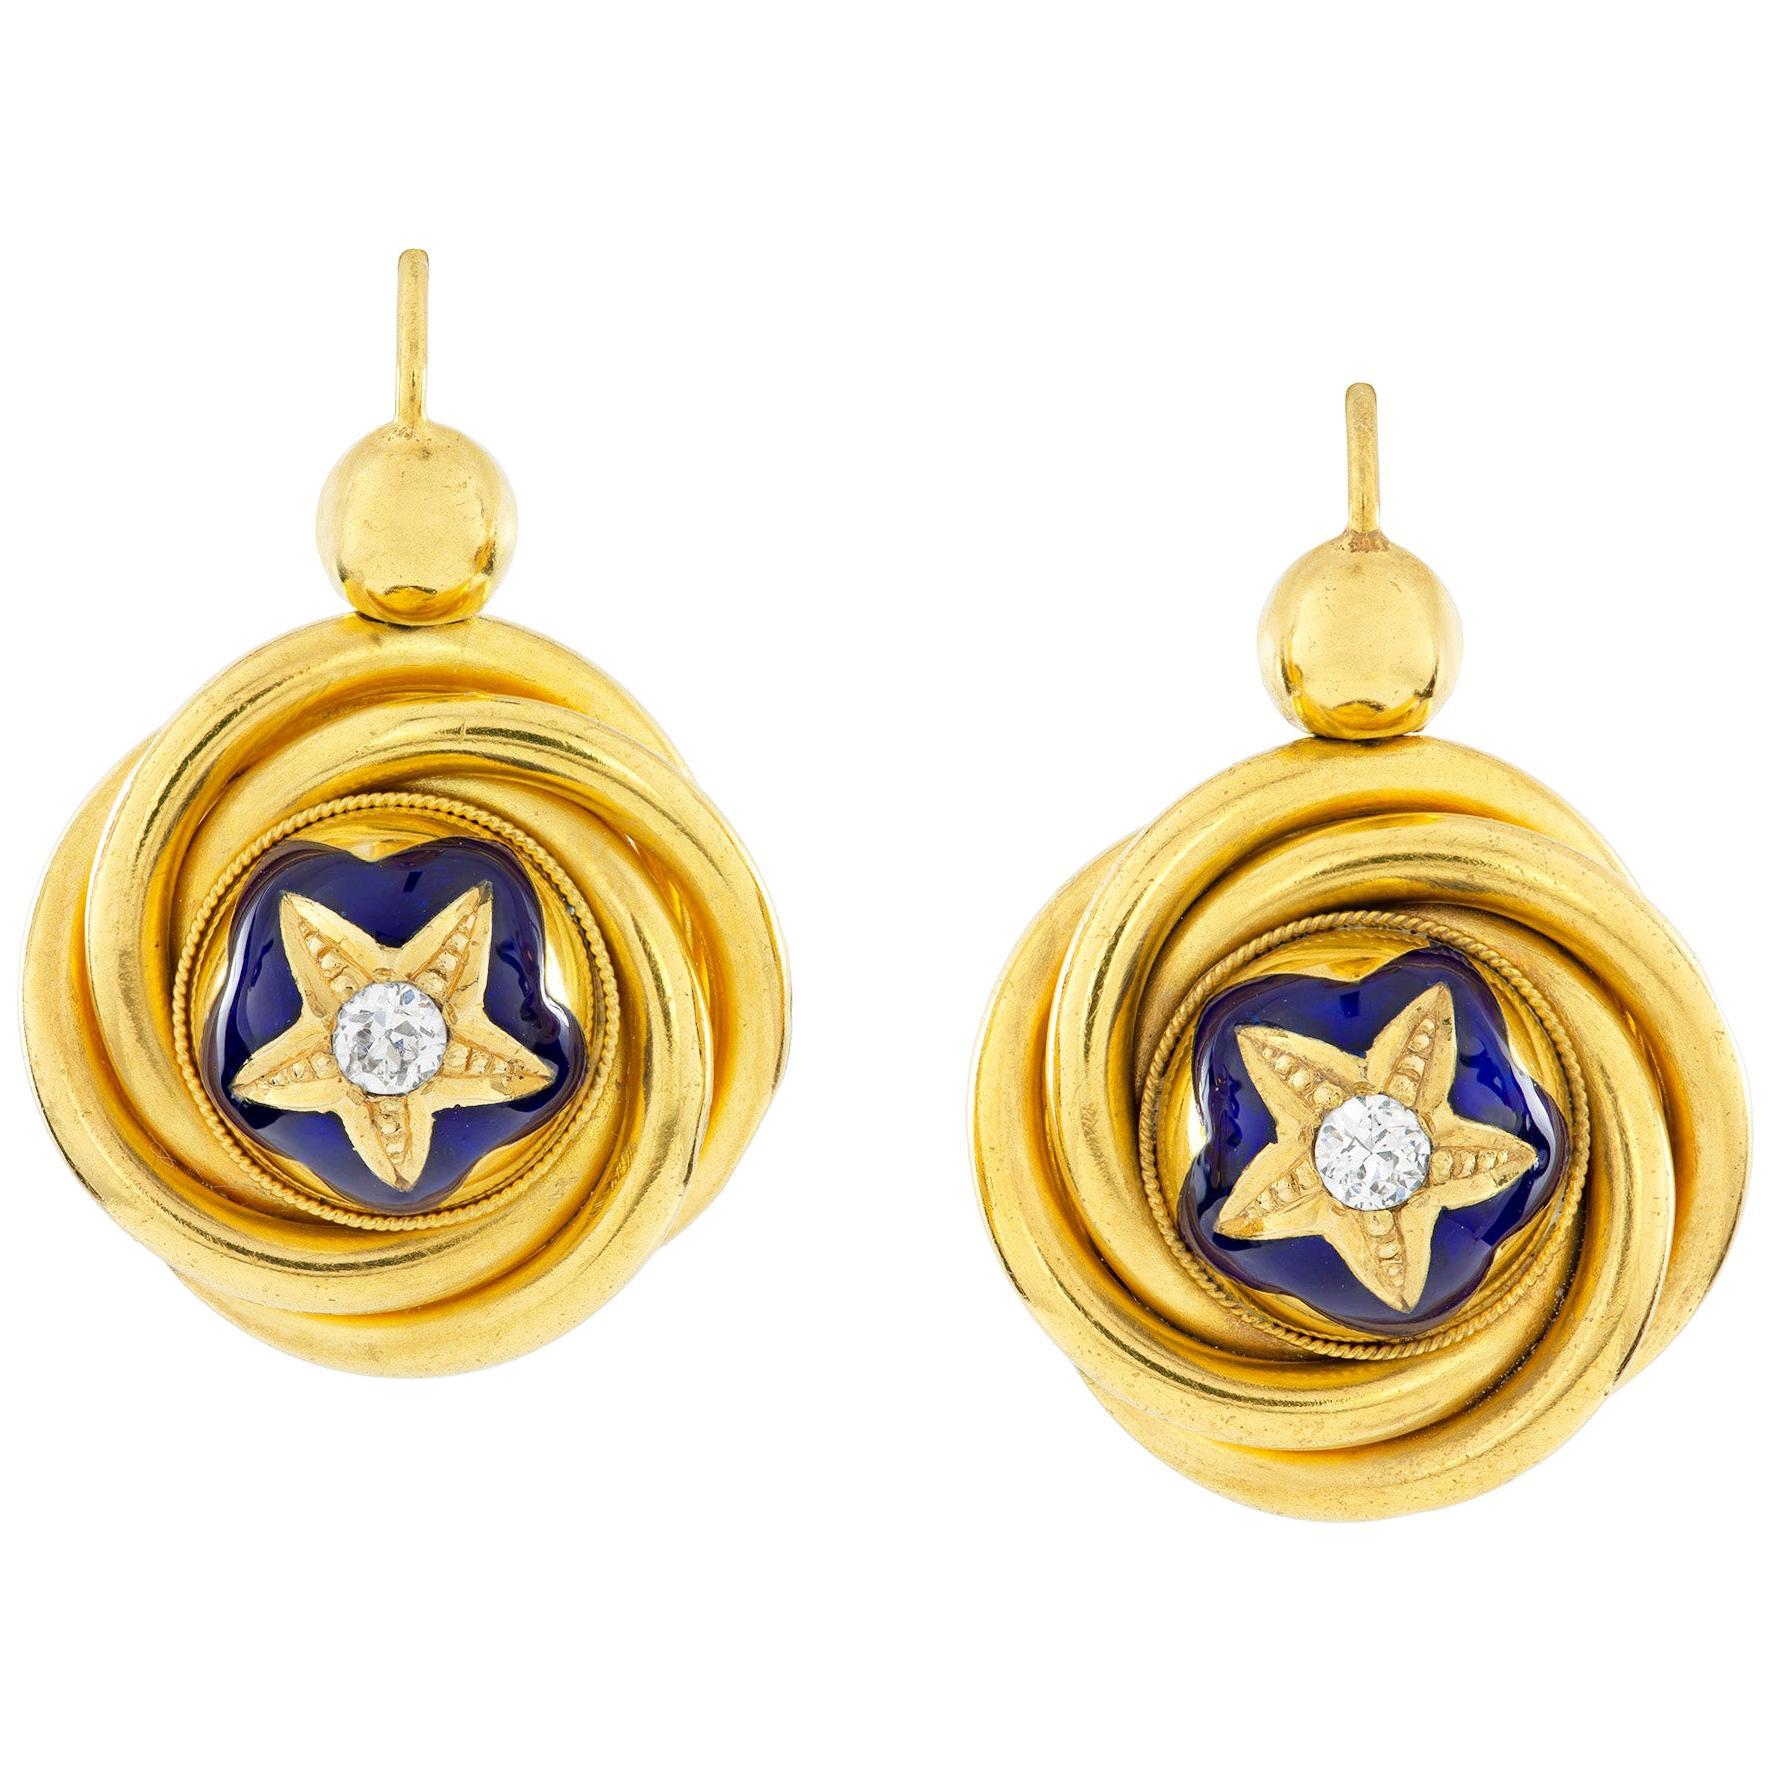 Pair of Victorian Gold, Diamond and Enamel Drop Earrings